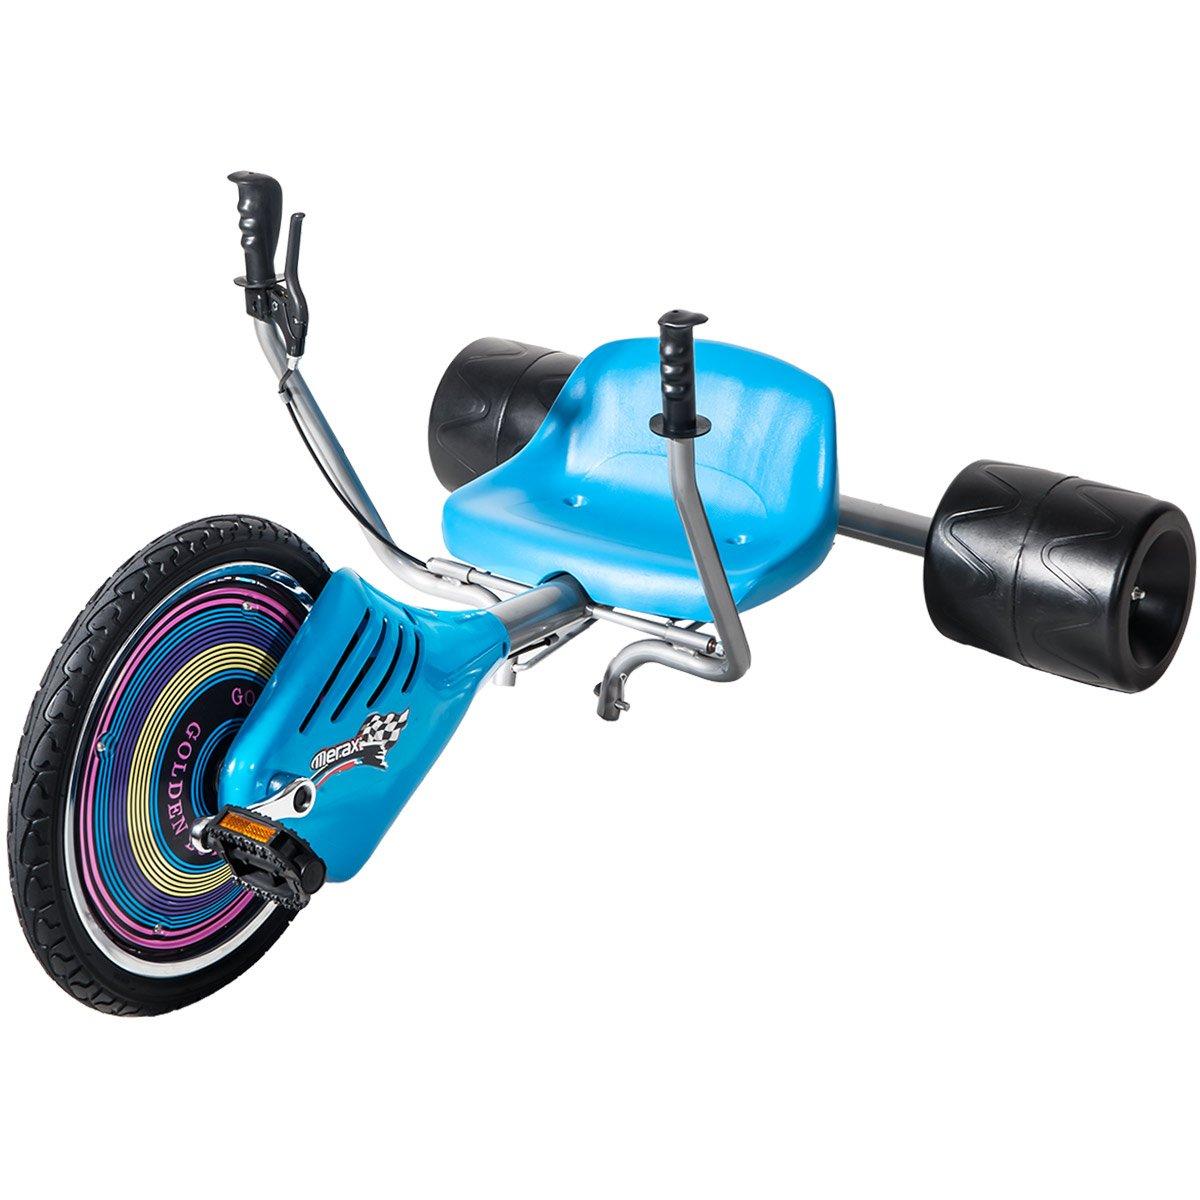 Merax. Children's Drift Trike with 15'' Front Tire by Merax.